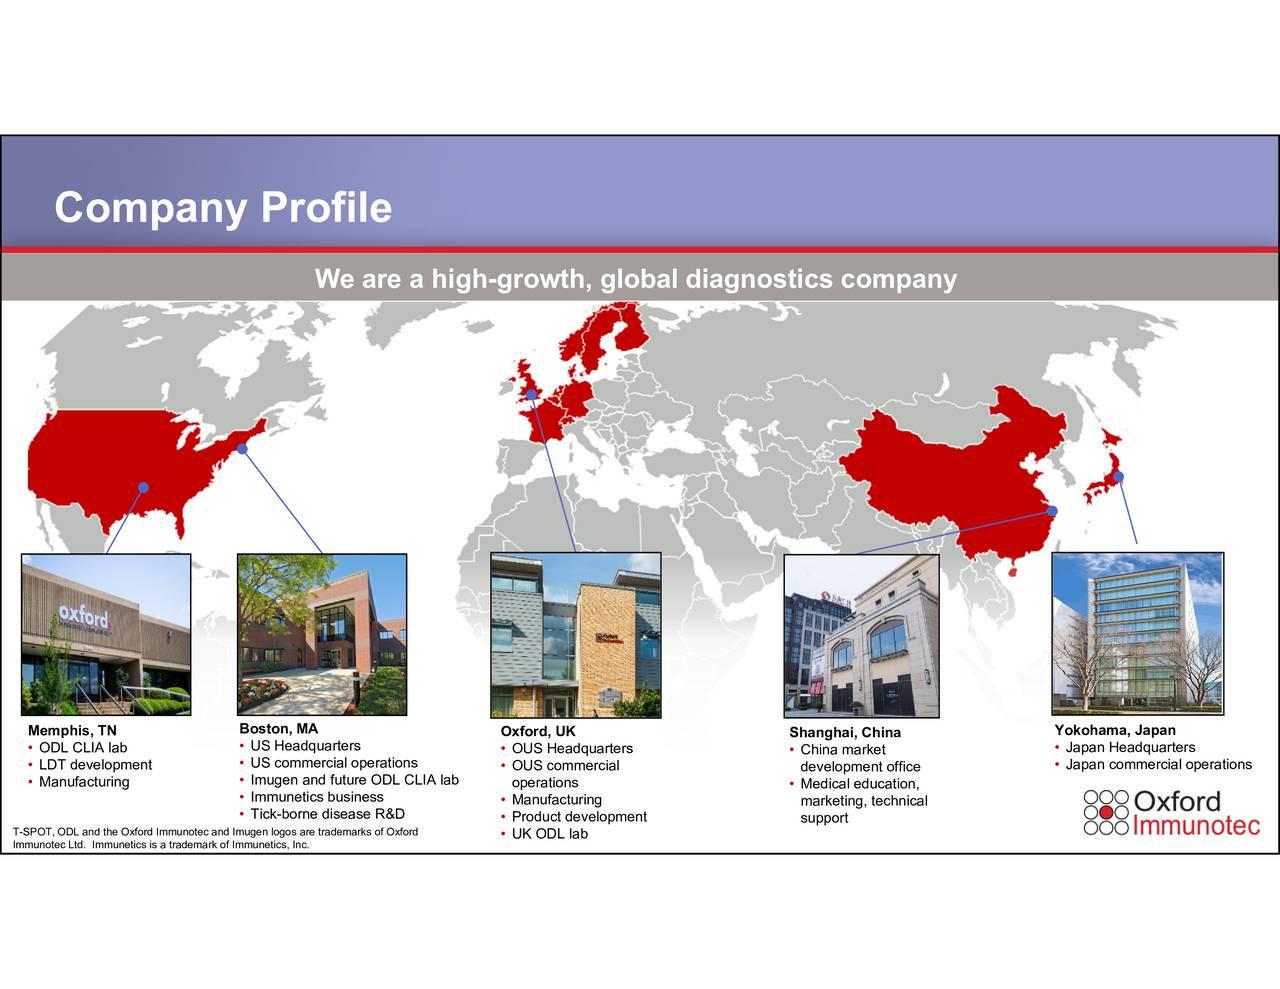 Yokohama, Japan ChineMeadkeletortitcnn, ical Shanghai, China 3 OUO SUSpadatmfrrtsliLgaopment Oxford, marks of Oxford We are a high-growth, global diagnostics company USUHSIaumgTnrr-tlunursiiasseRLIDlab Bostn,MA rademark of Immunetics, Inc. Company Profile ODLLDMTdIevaoturient Memp , TN T-SPOT, ODL and the Oxford Immunotec and Imugen logos are trade